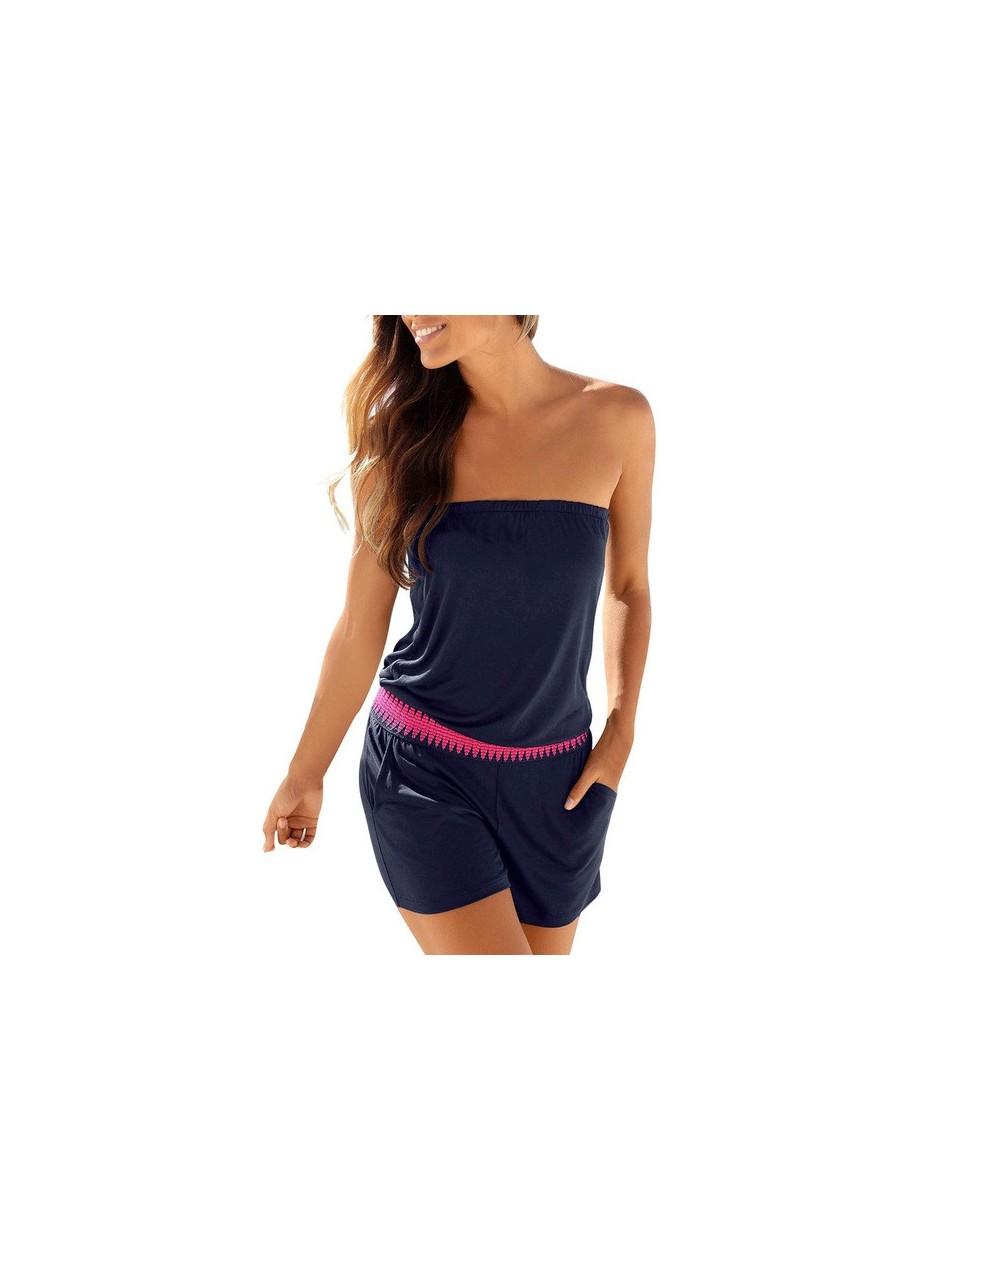 Women Playsuits Shorts Sleeveless Solid Summer Overalls Rompers Pockets Femme Beachwear Girl Short Jumpsuit Off Shoulder Leo...